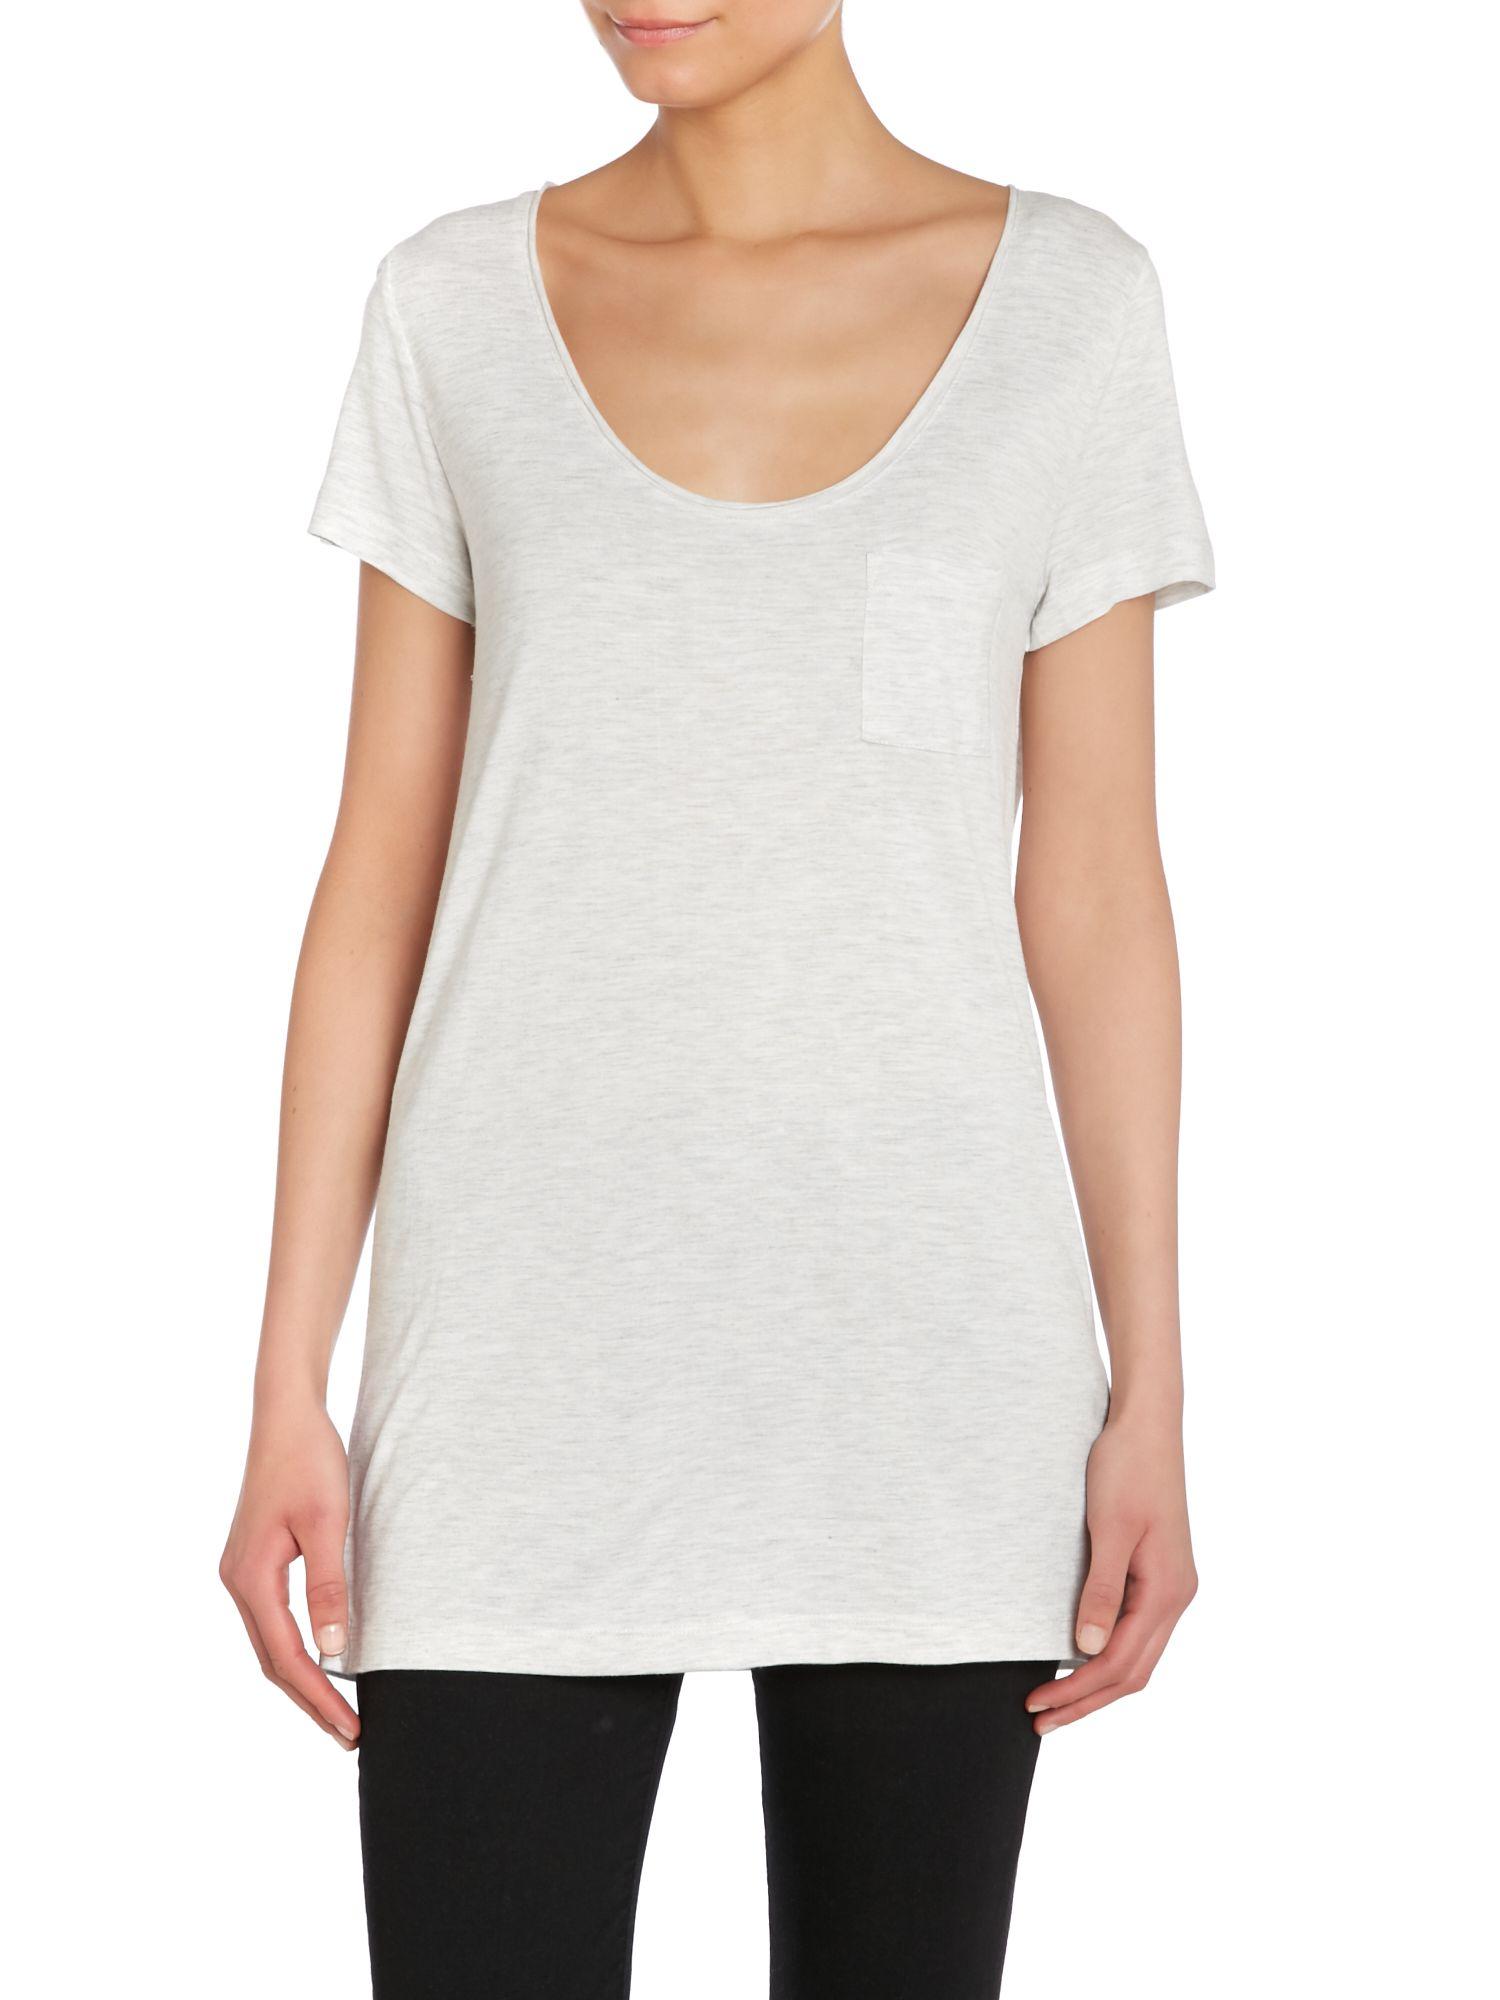 Lyst noa noa short sleeve t shirt in metallic for Silver metallic shirt women s